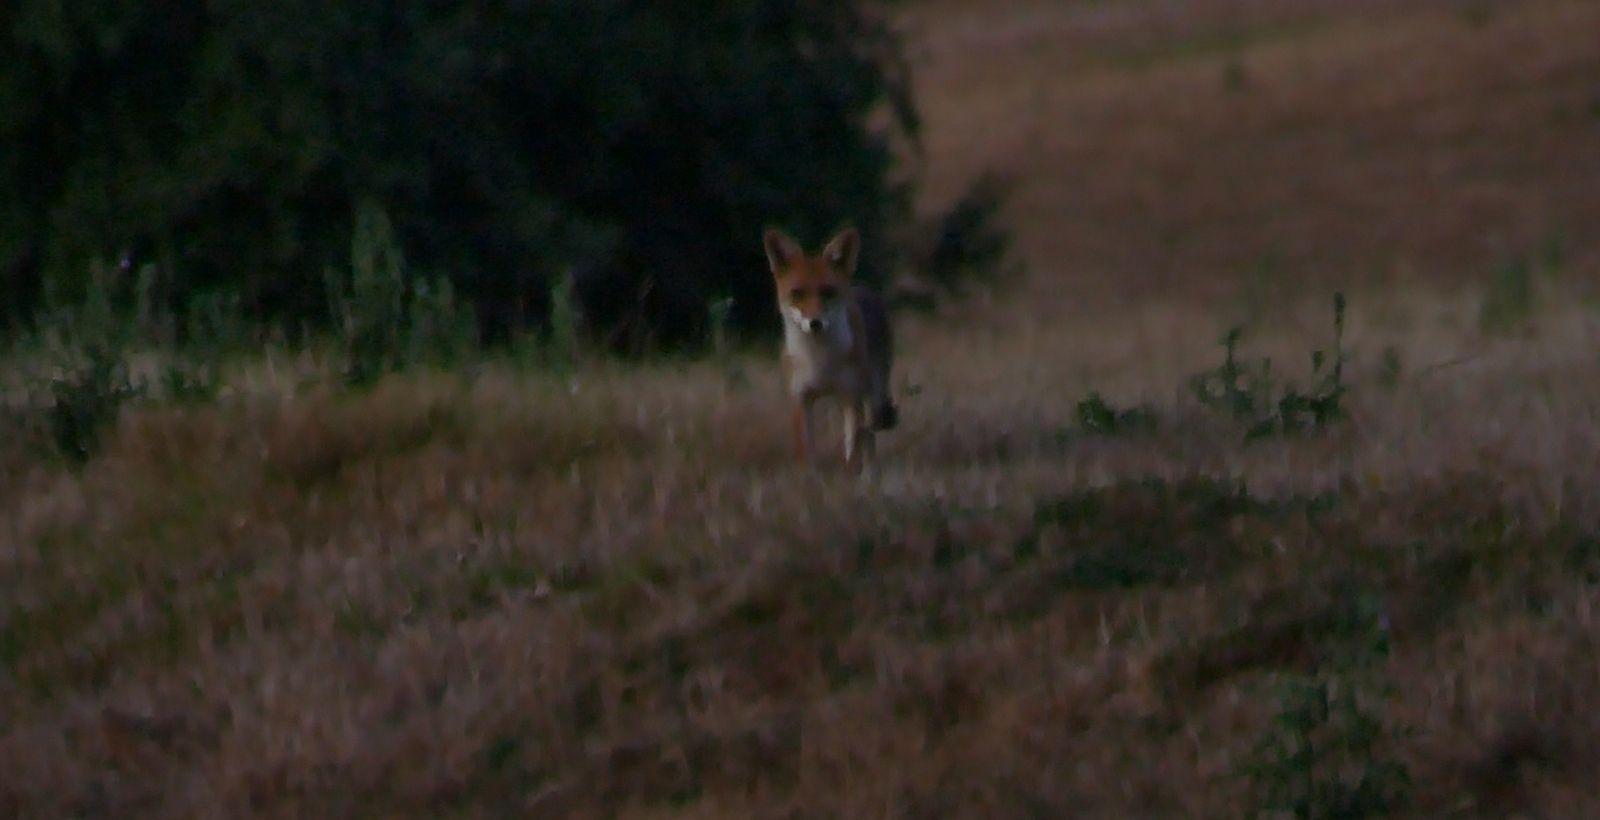 Premier renard tarnais, 8 août 2020